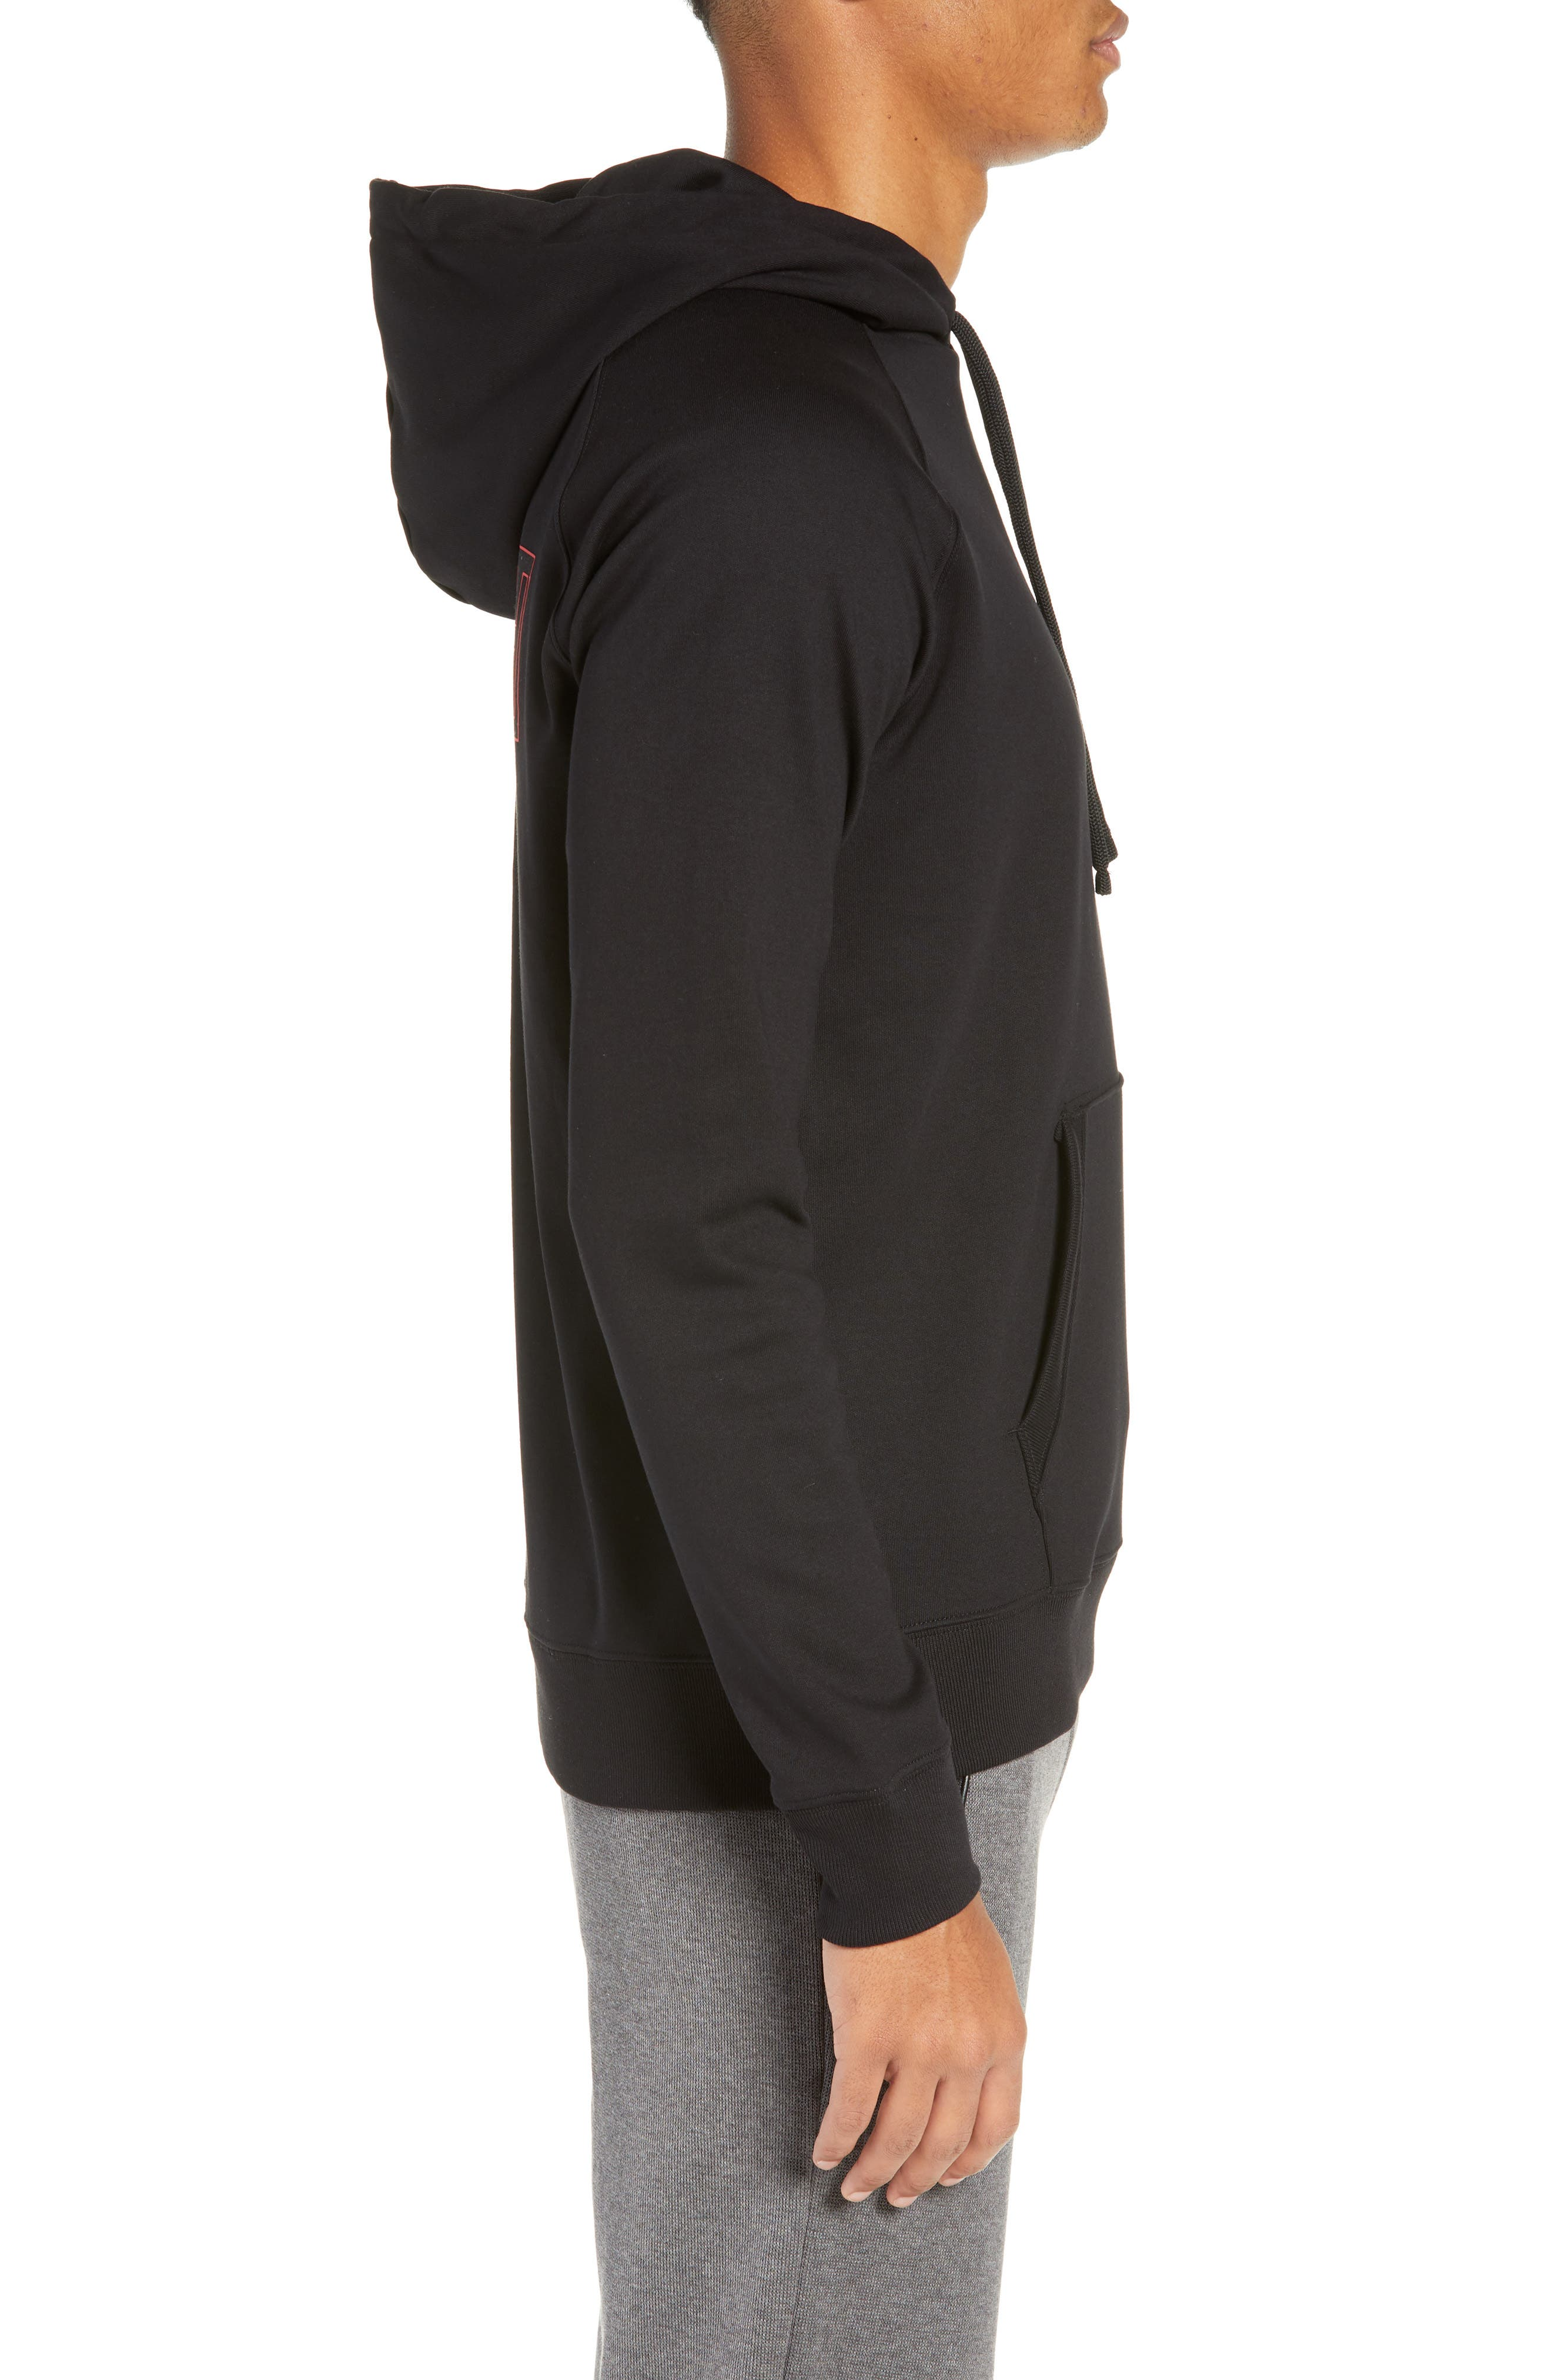 Darti Hoodie Sweatshirt,                             Alternate thumbnail 3, color,                             001